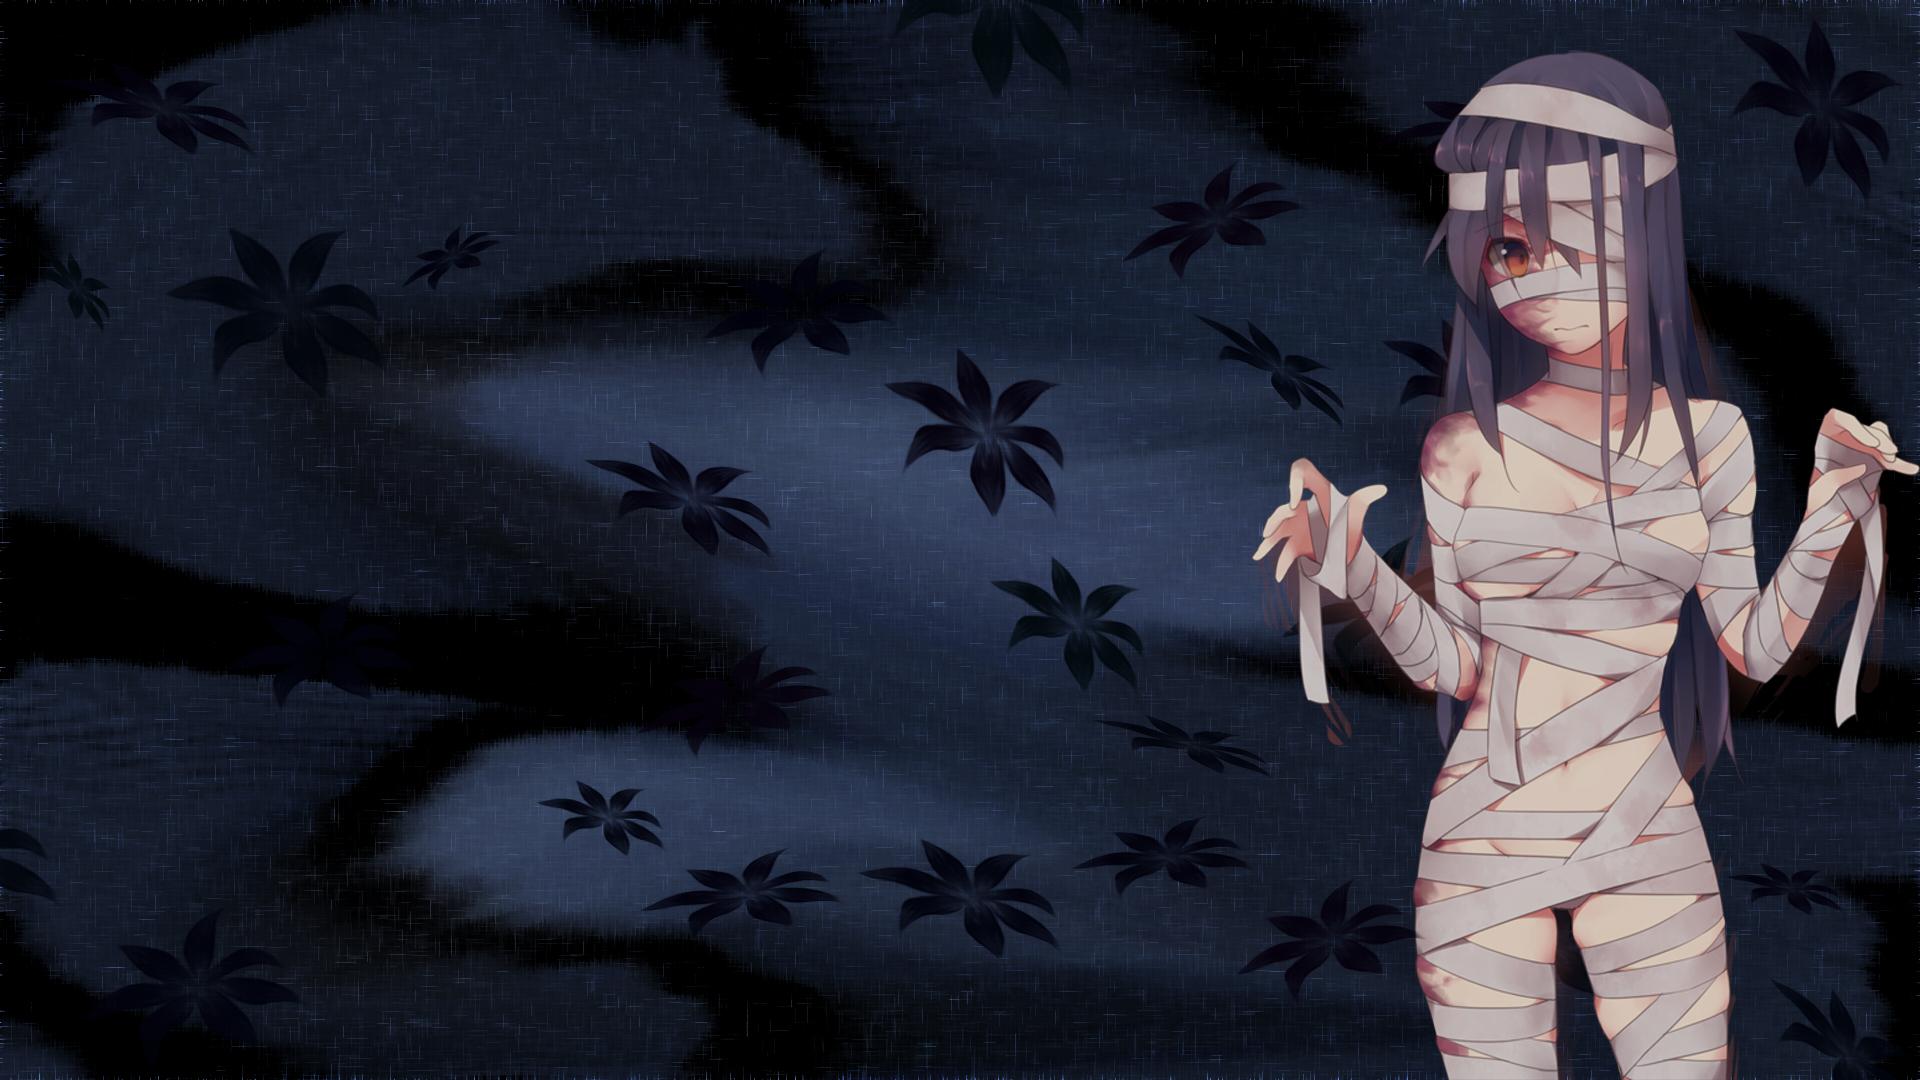 katawa shoujo wallpaper 4 hanako by nedeko on deviantart